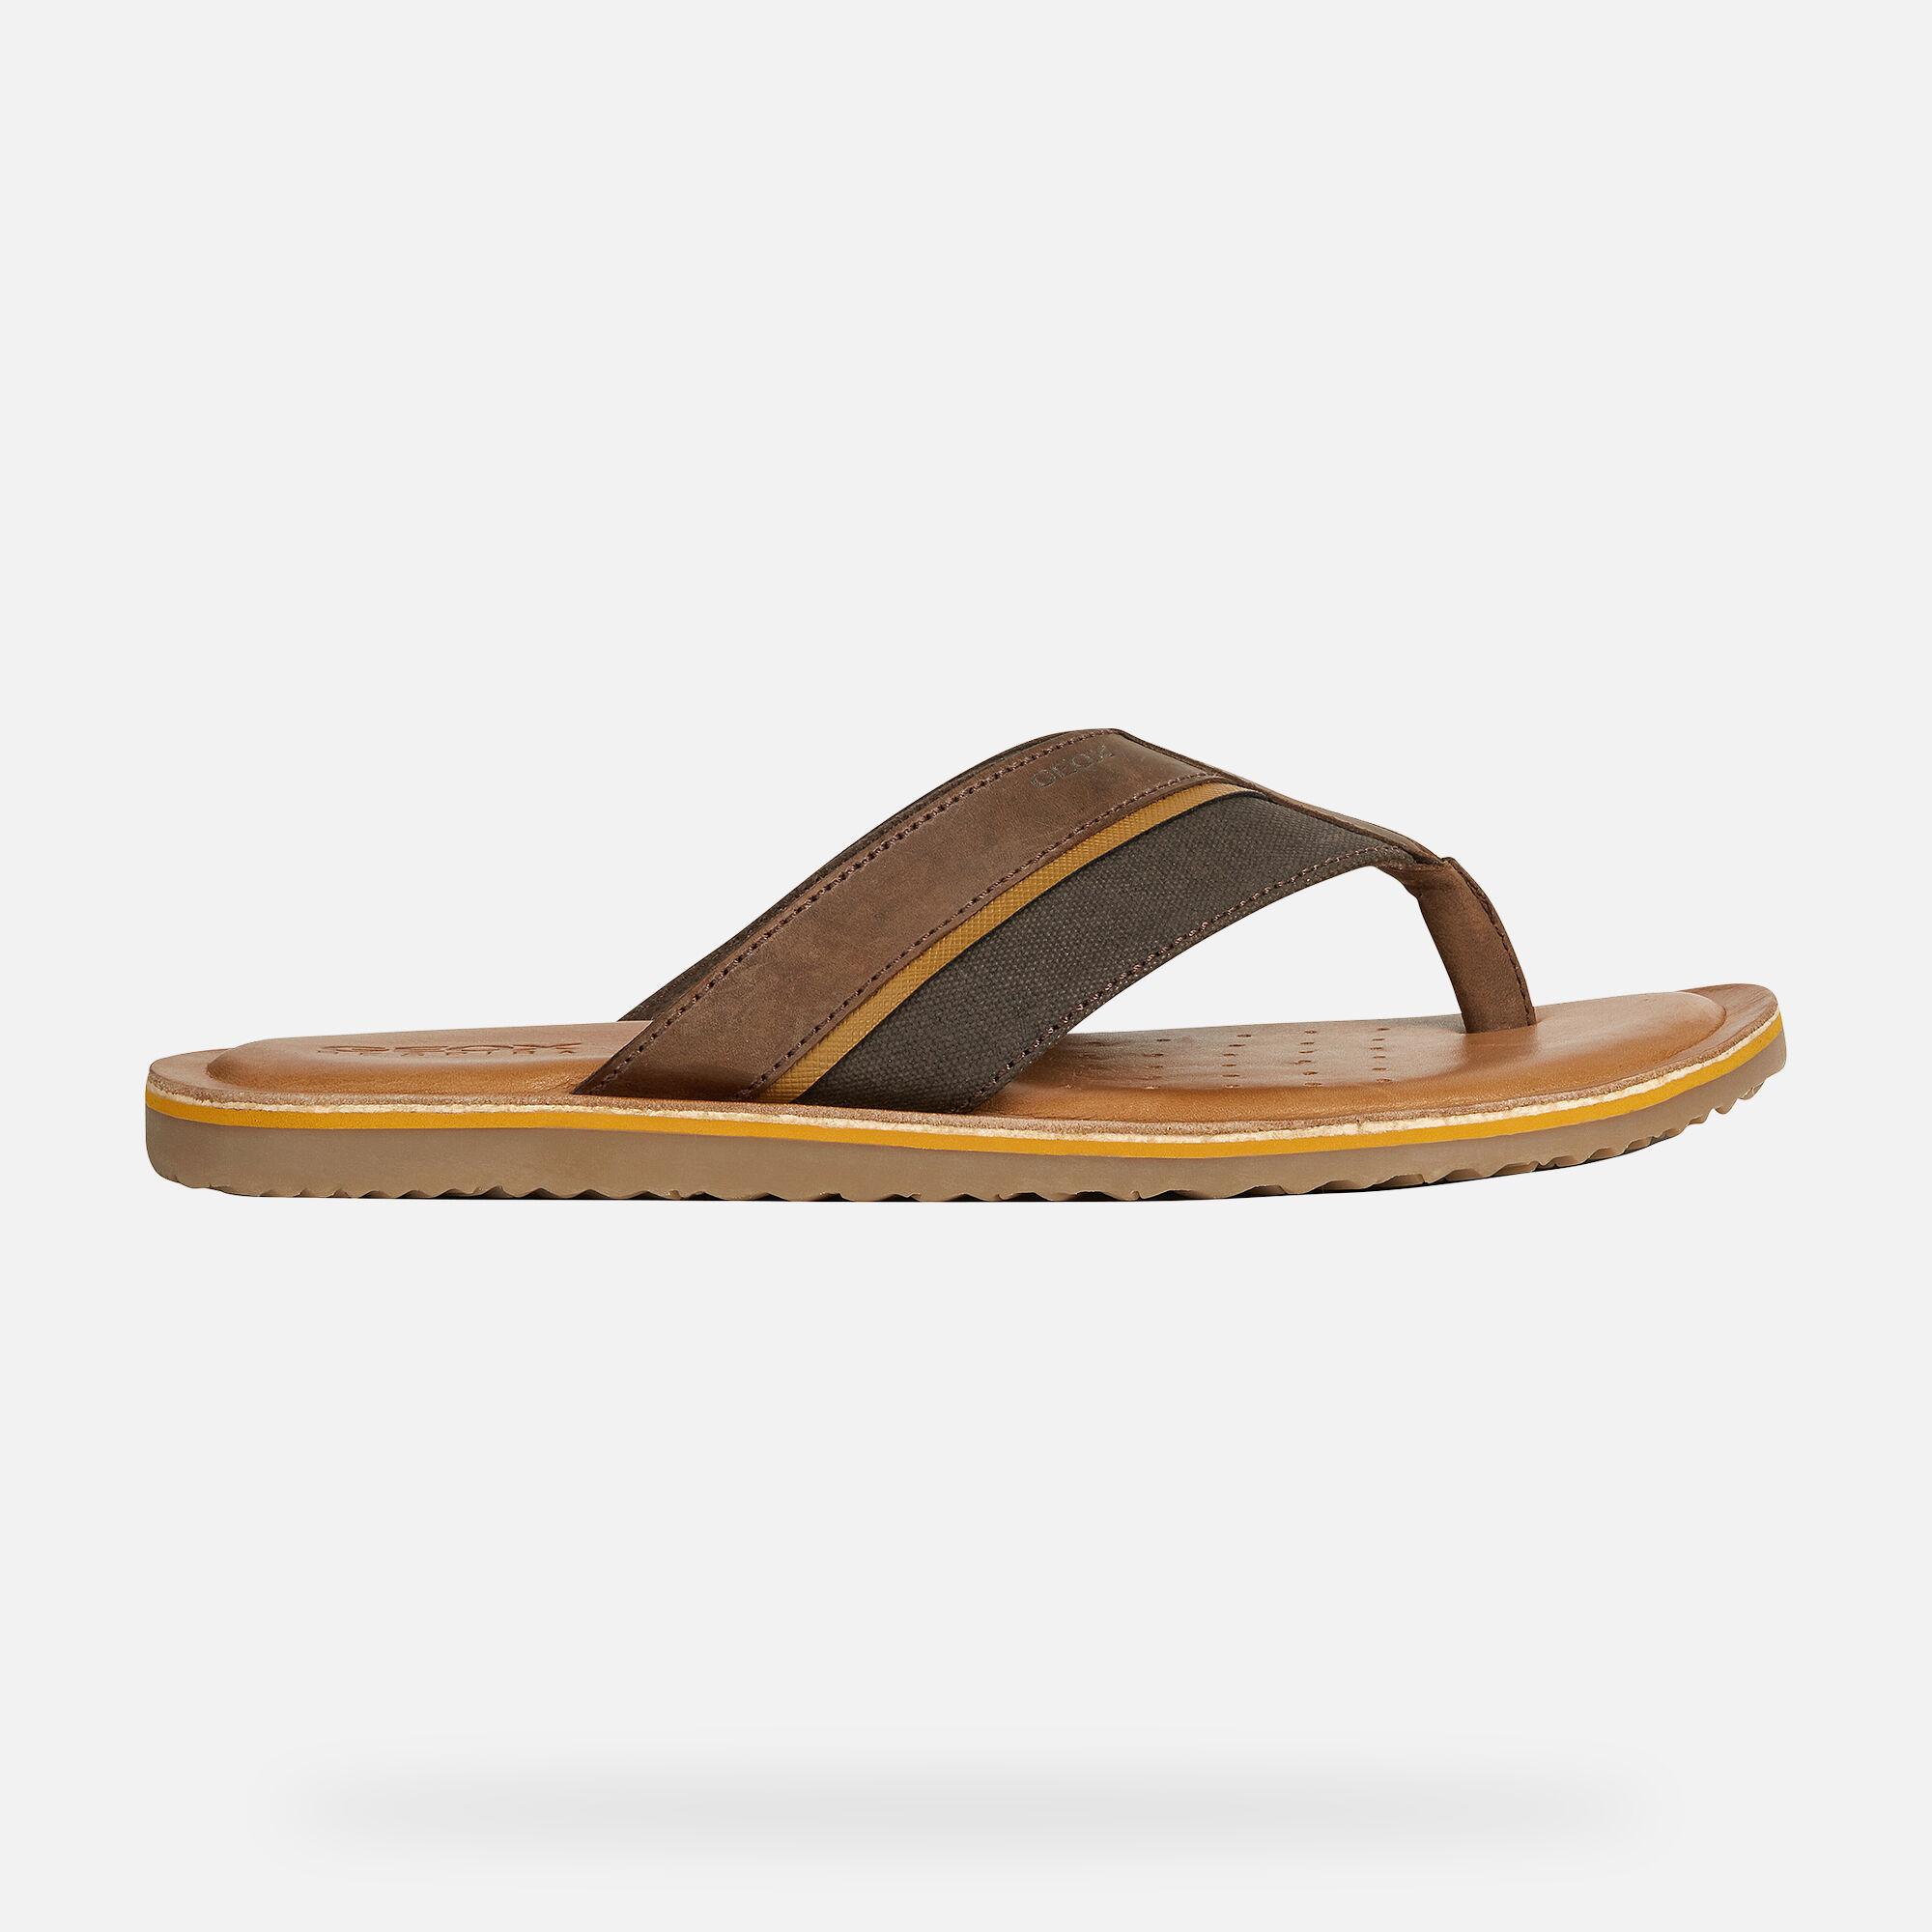 Geox ARTIE Man: Coffee Sandals | Geox